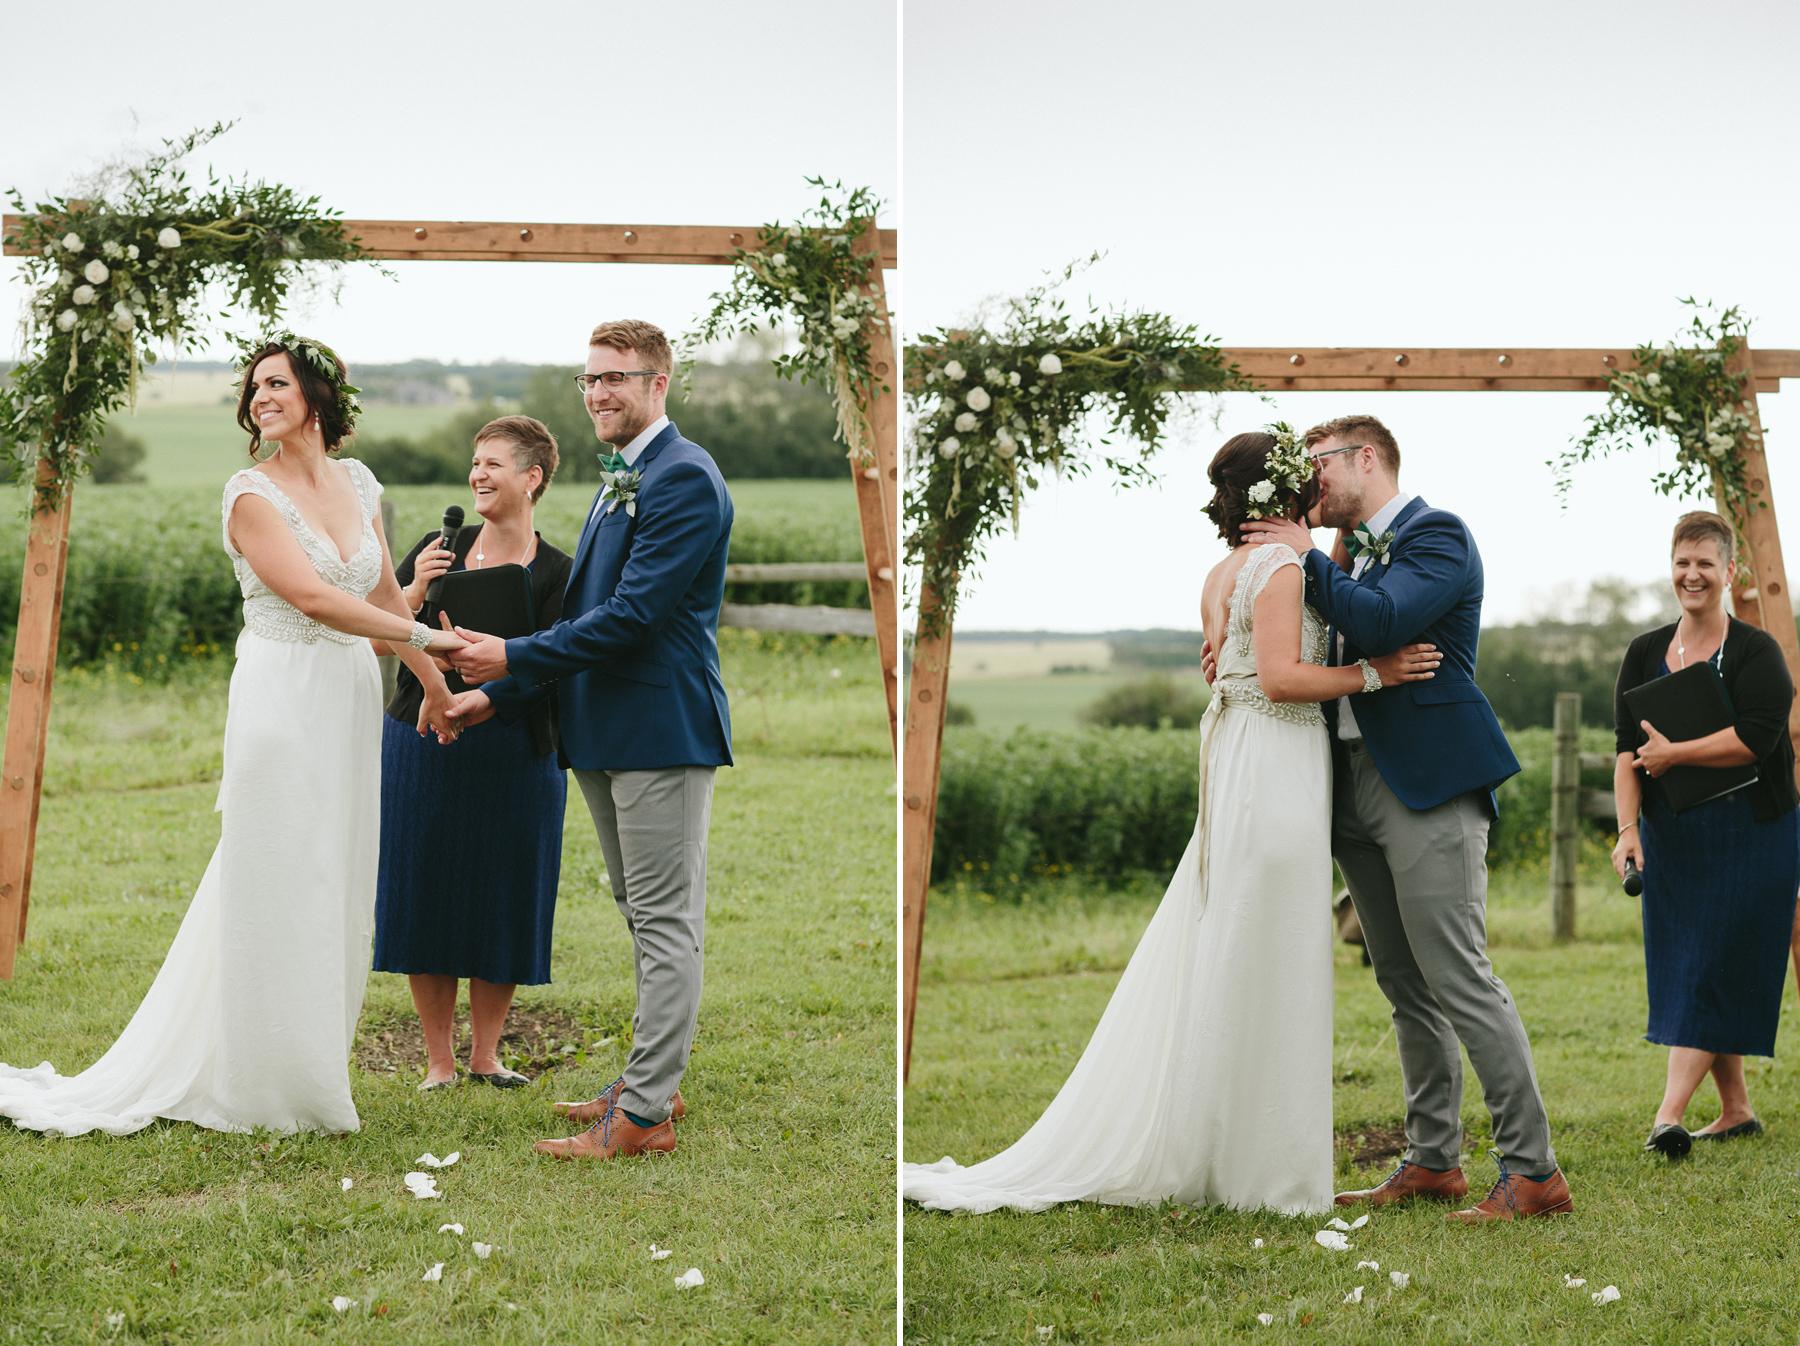 alberta-farm-wedding-photographer-rp-wj-141.jpg